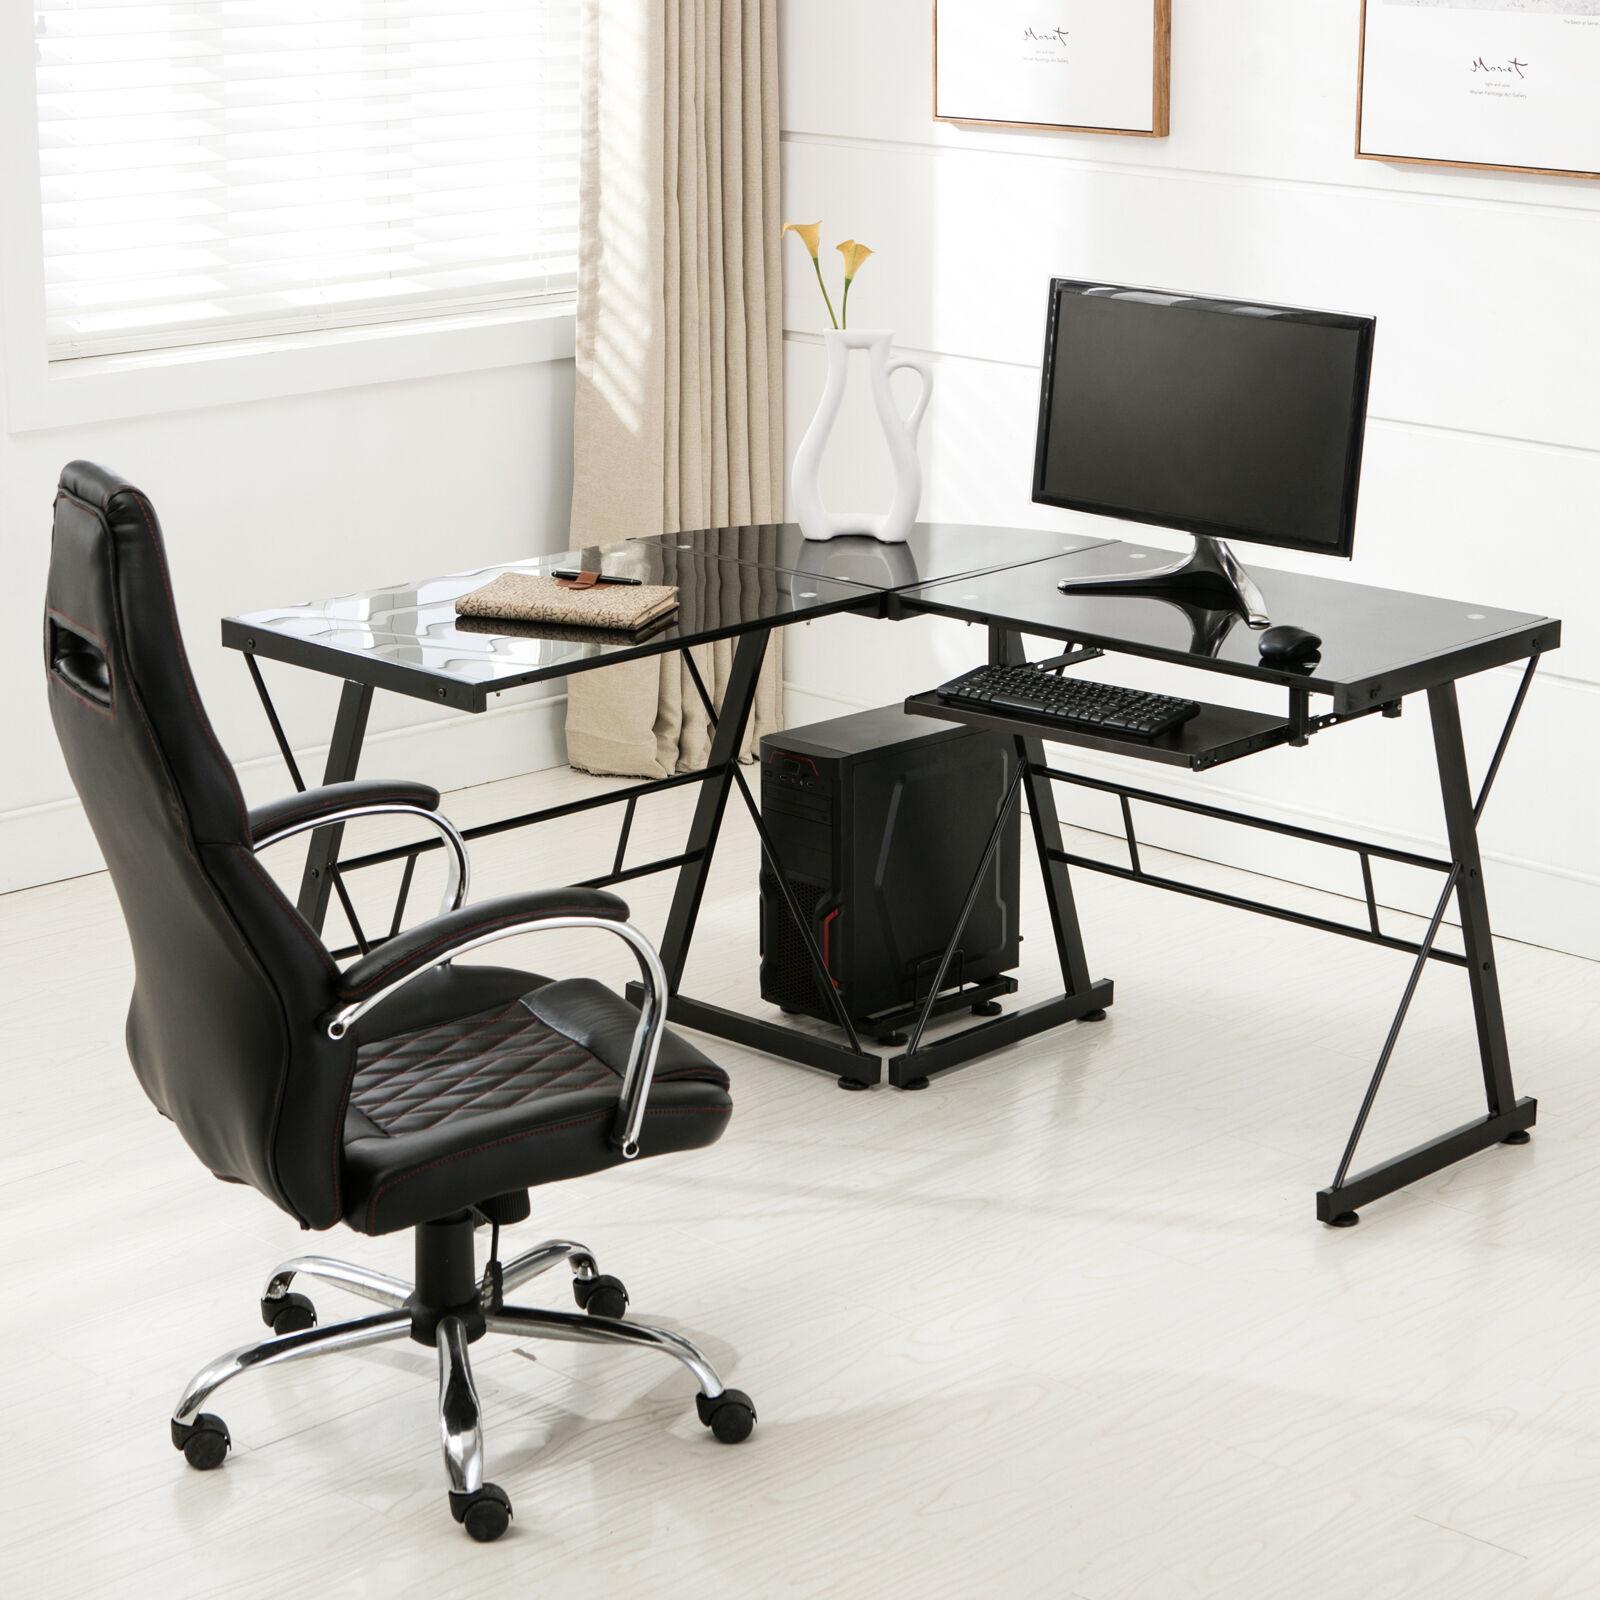 Details about L-Shape Glass Computer Desk PC Laptop Table Home Office  Corner Workstation Black